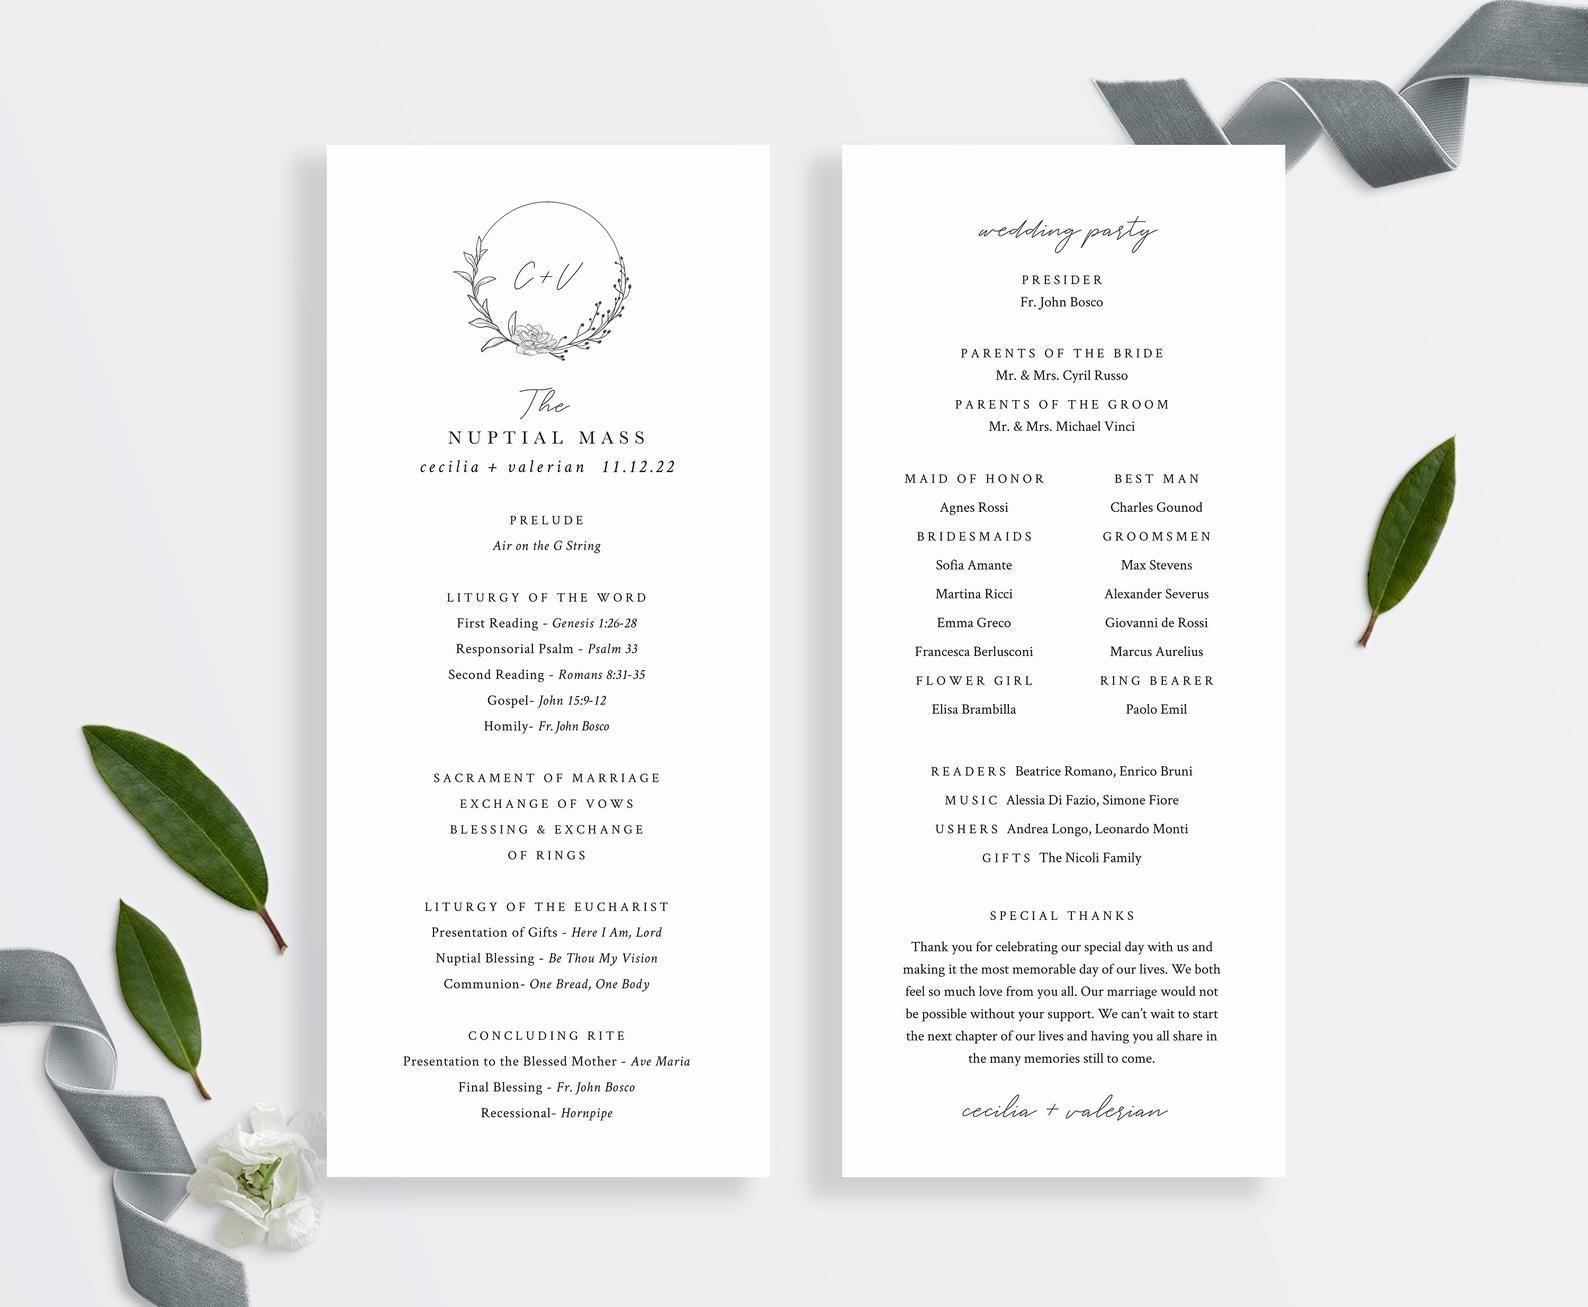 St. Cecilia Catholic Wedding Program Template with Mass